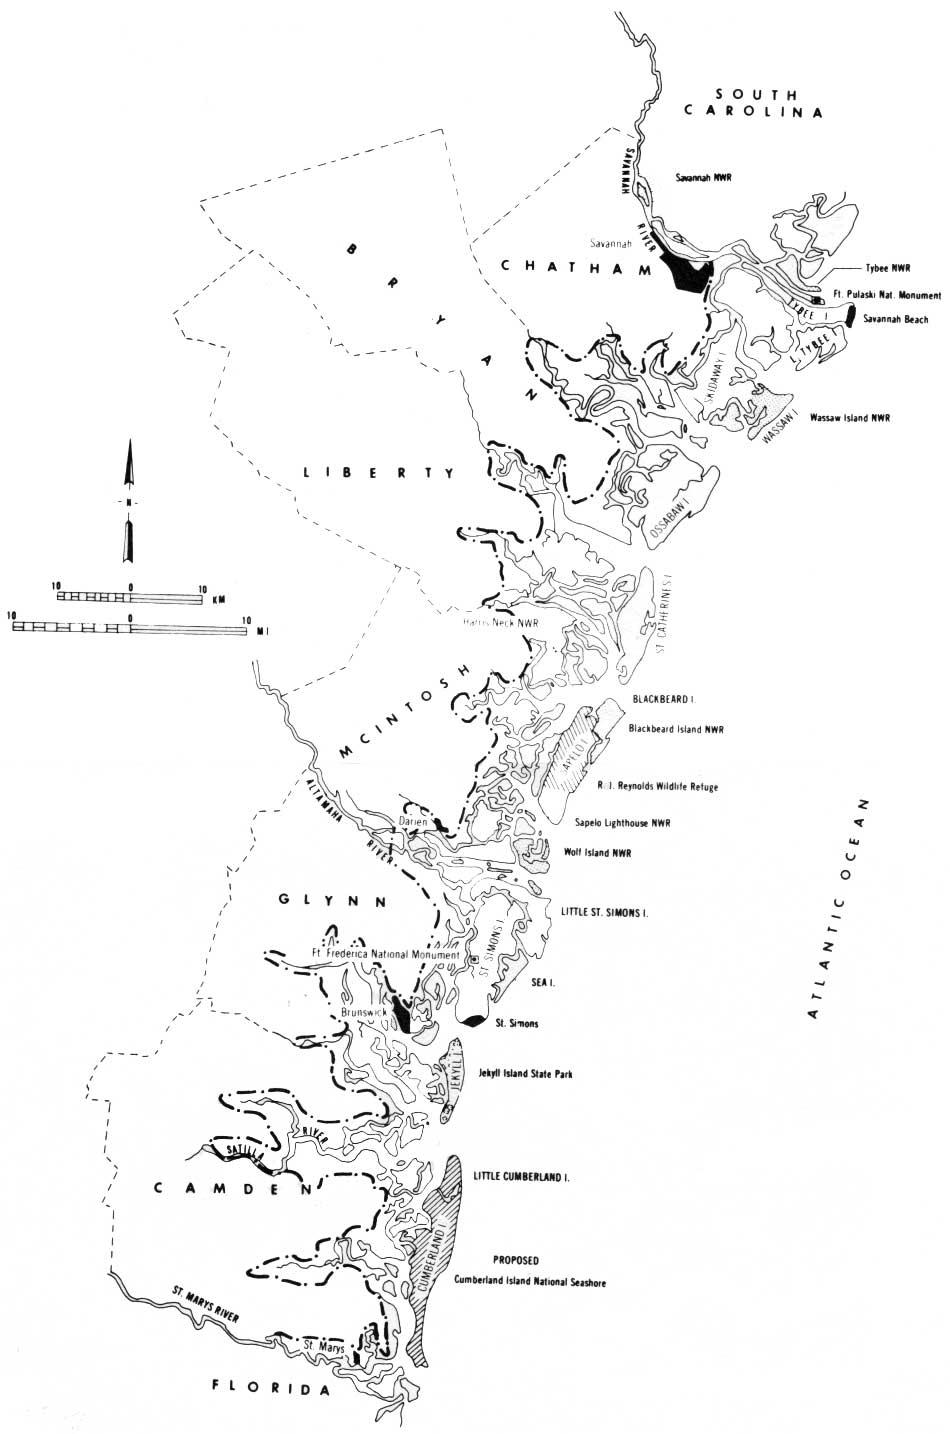 An Ecological Survey of the Coastal Region of Georgia